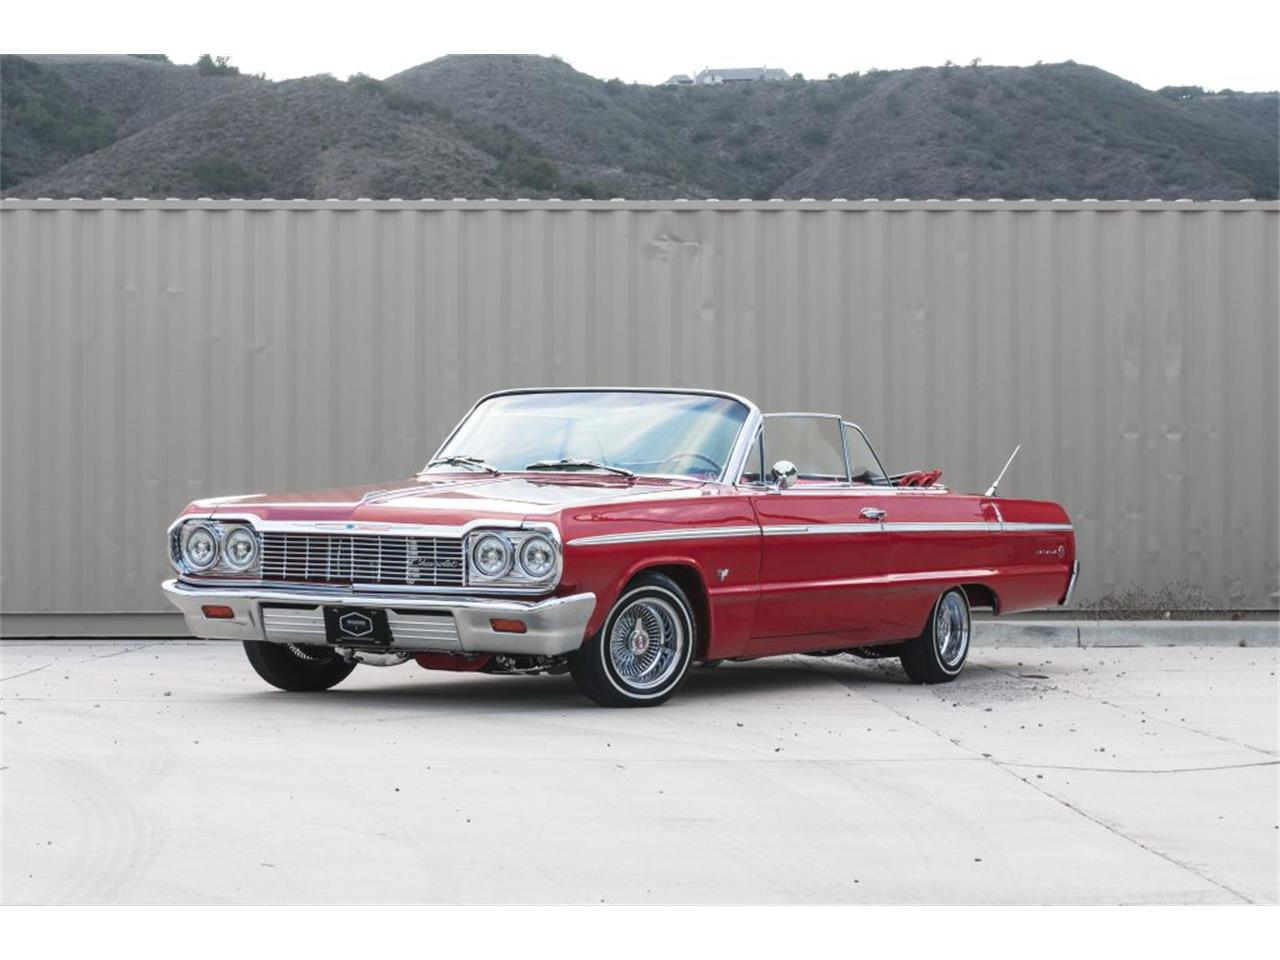 1964 Chevrolet Impala For Sale Classiccarscom Cc 1166987